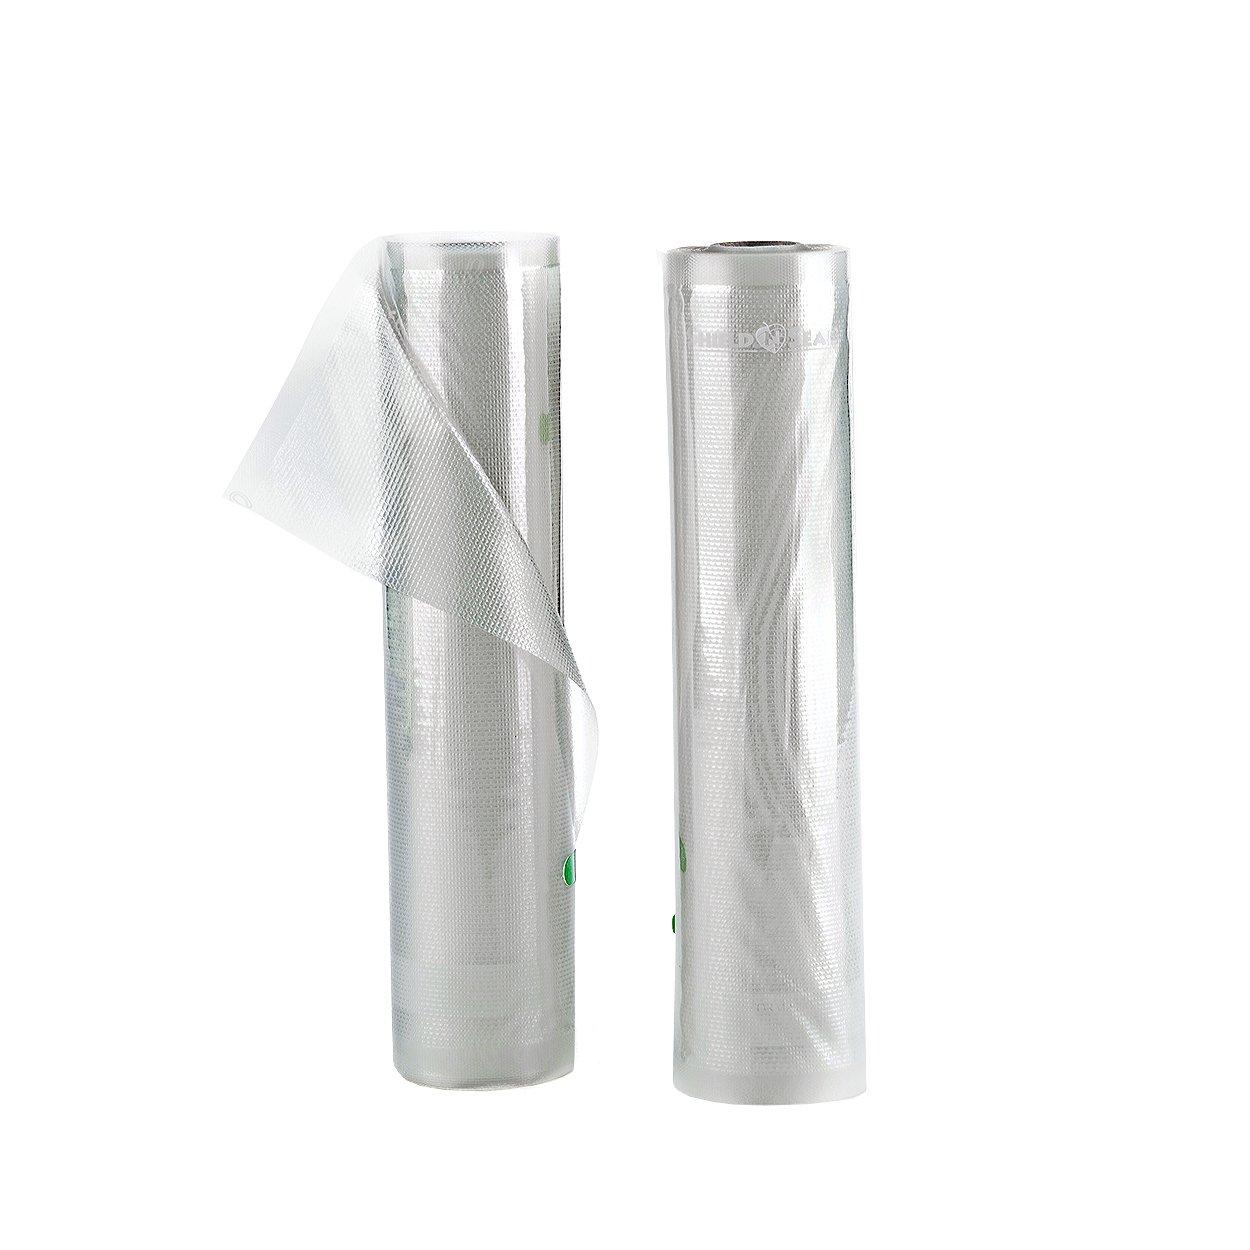 ShieldNSeal 11'' x 19.5' All Clear Vacuum Sealer Rolls SNS 1500